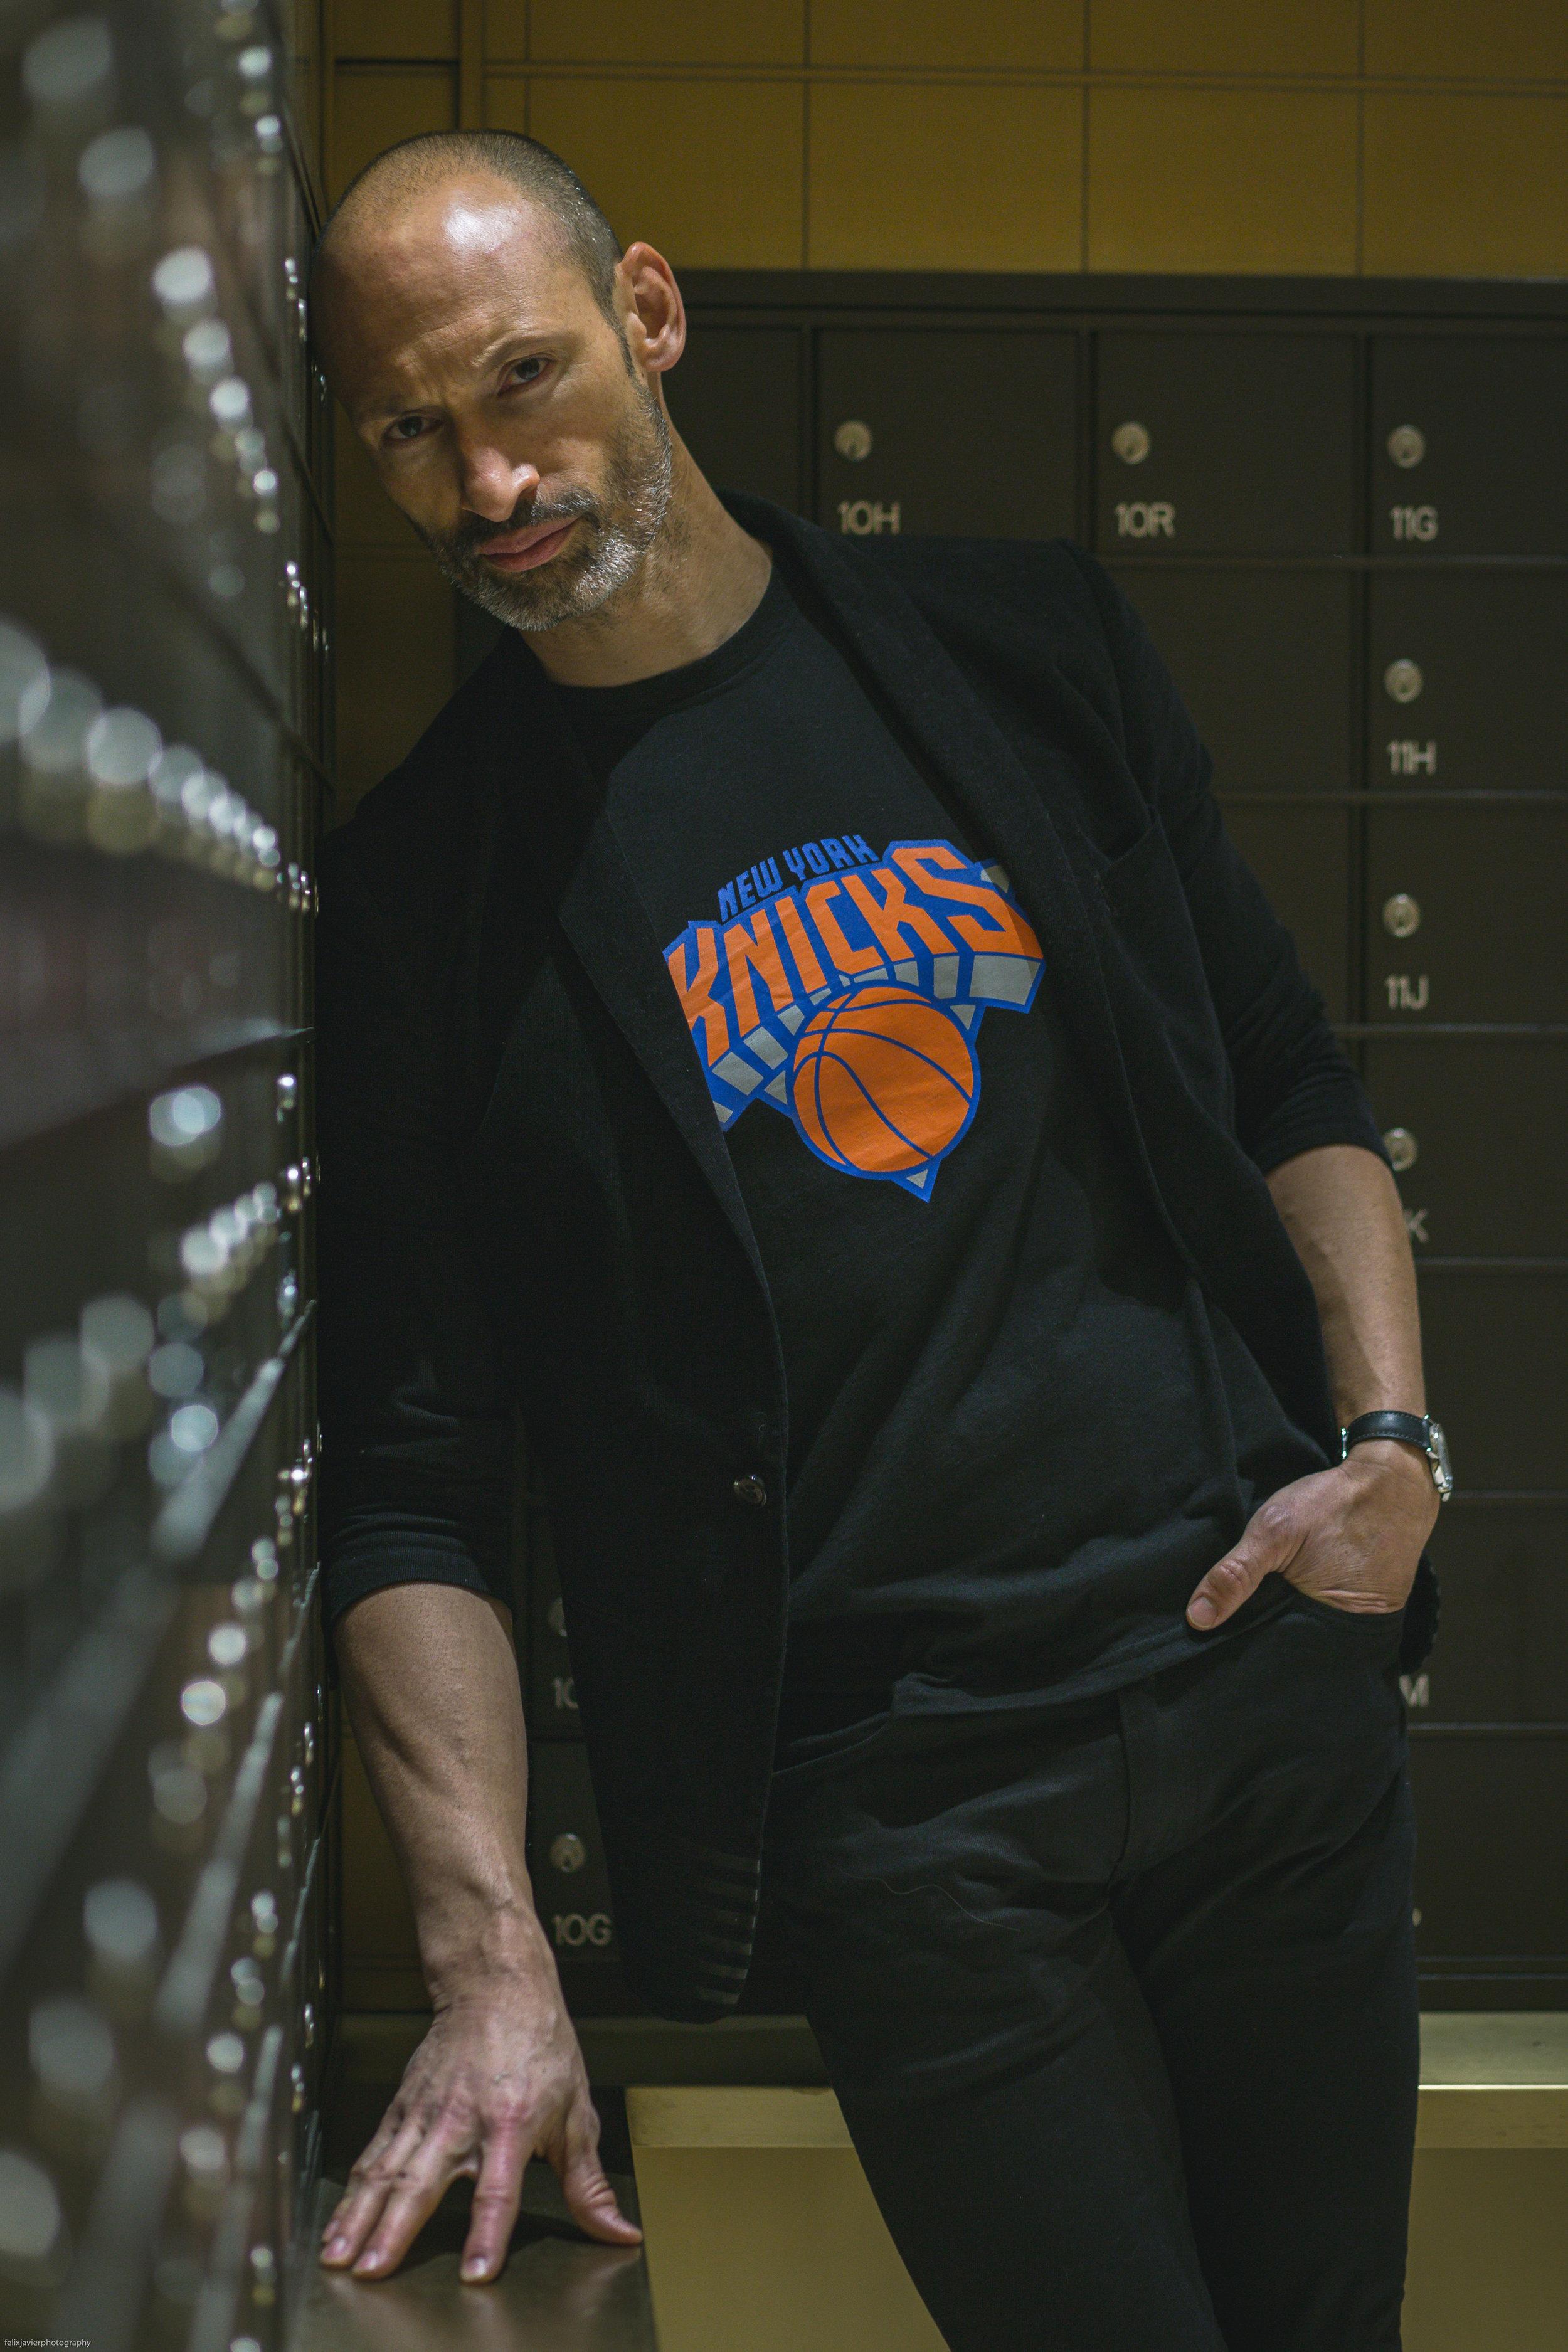 Grungy Gentleman x New York Knicks 11.jpg